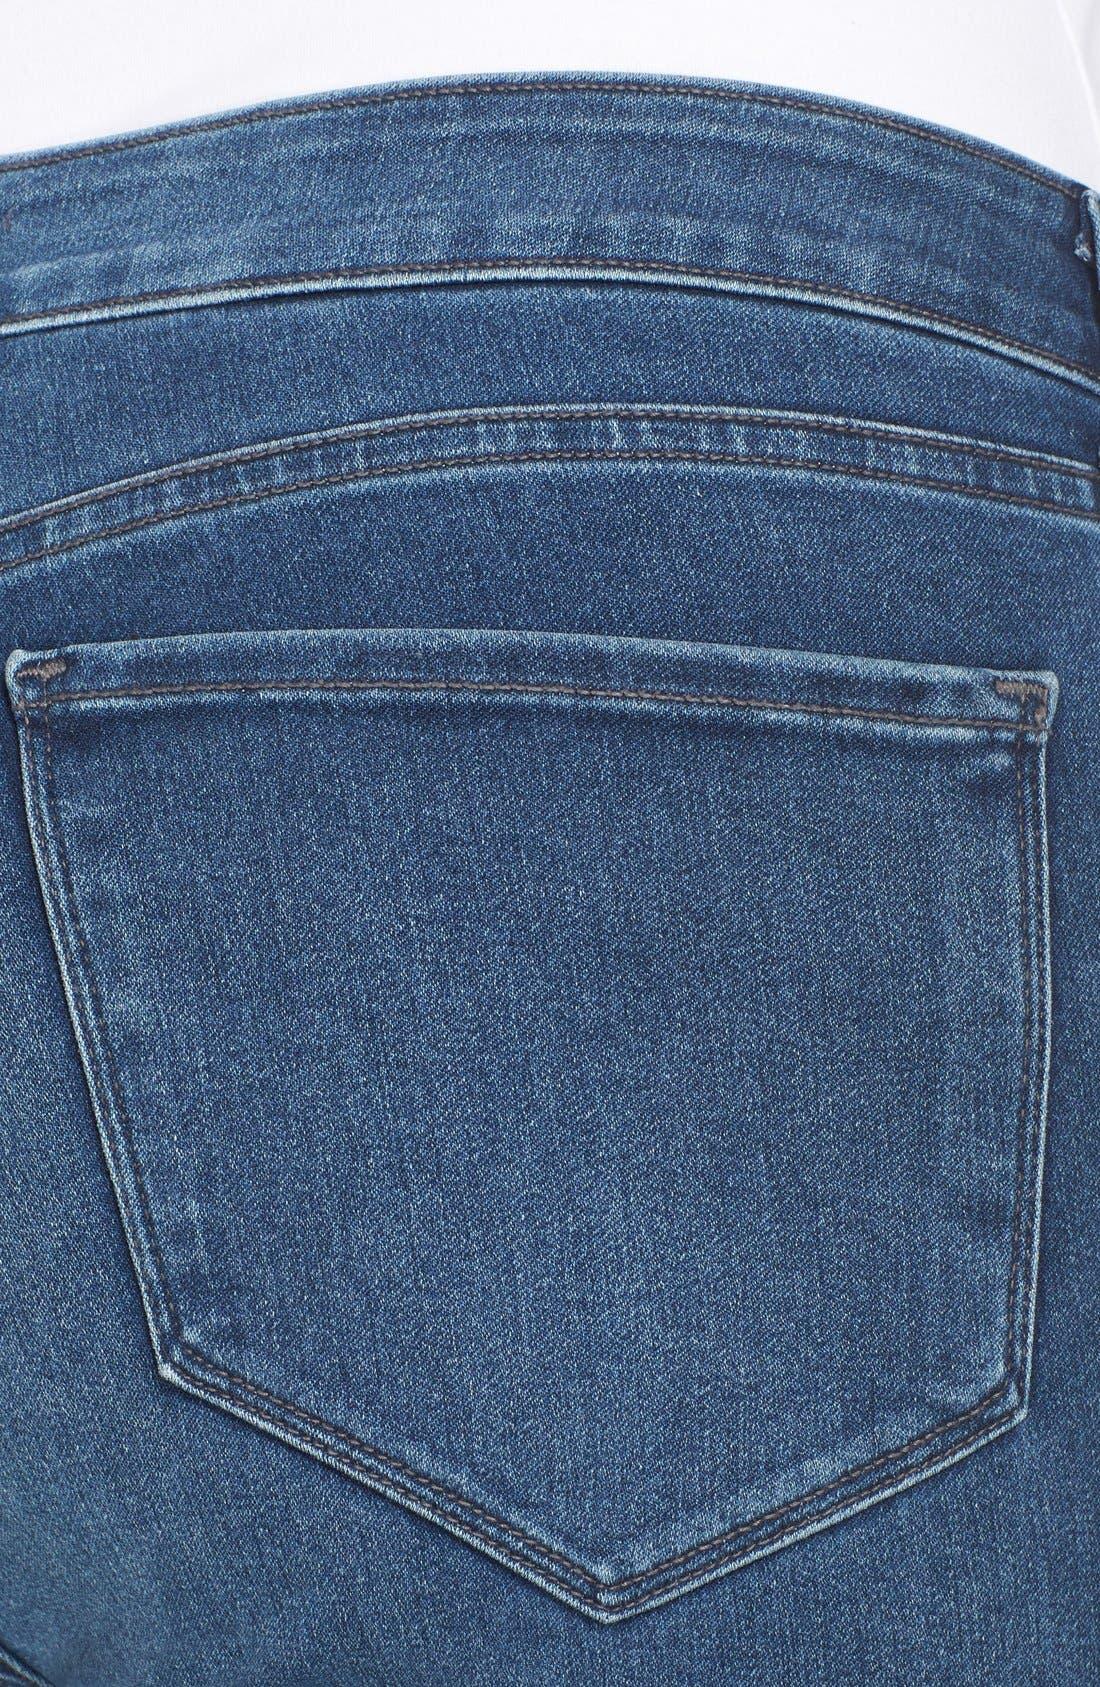 NYDJ, 'Alina' Stretch Skinny Jeans, Alternate thumbnail 4, color, 461